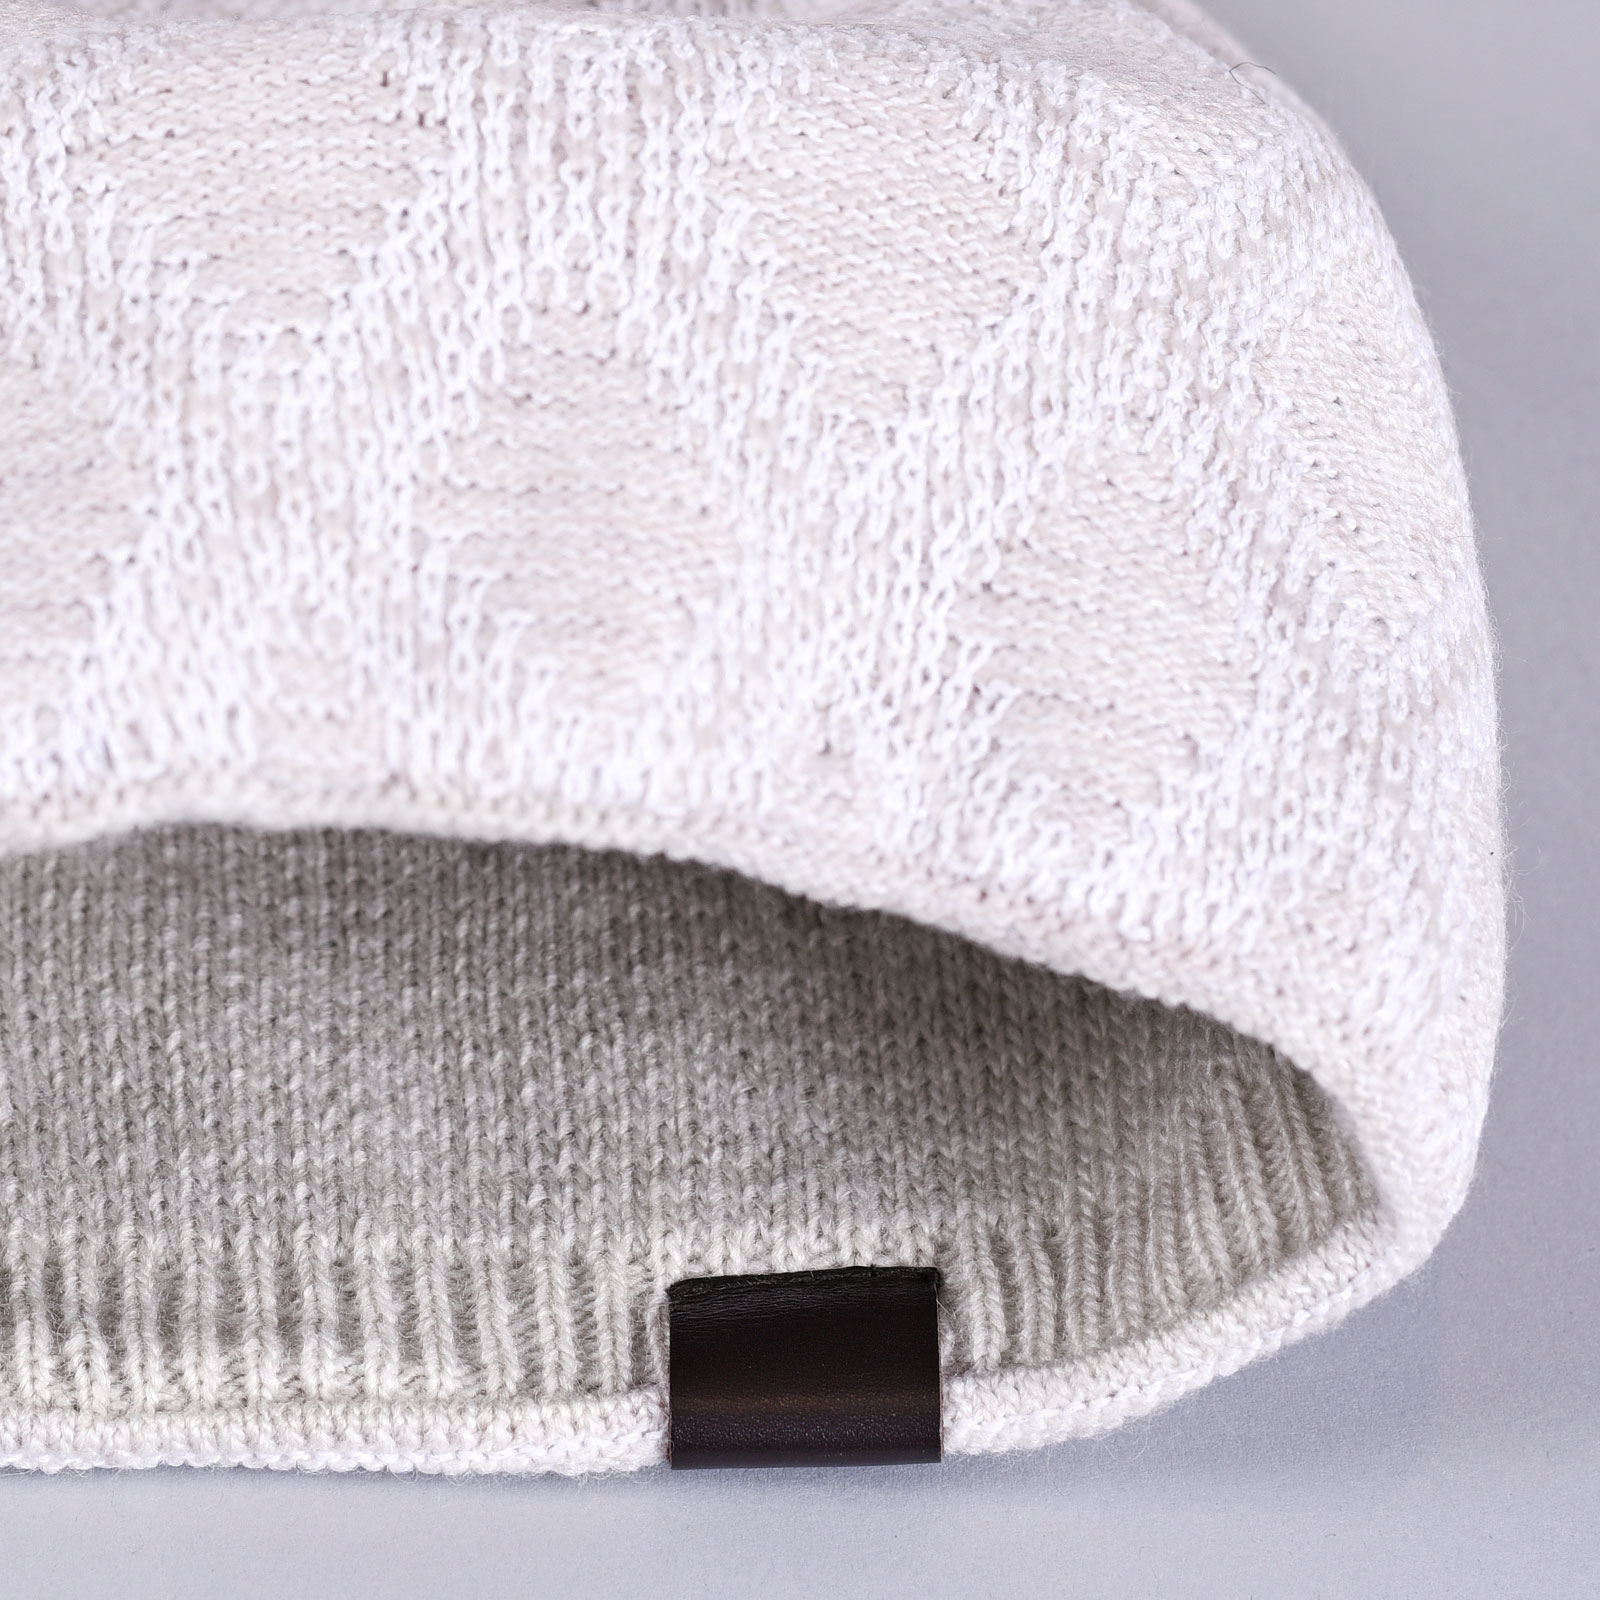 CP-01046-D16-2-bonnet-femme-tendance-beige-et-blanc